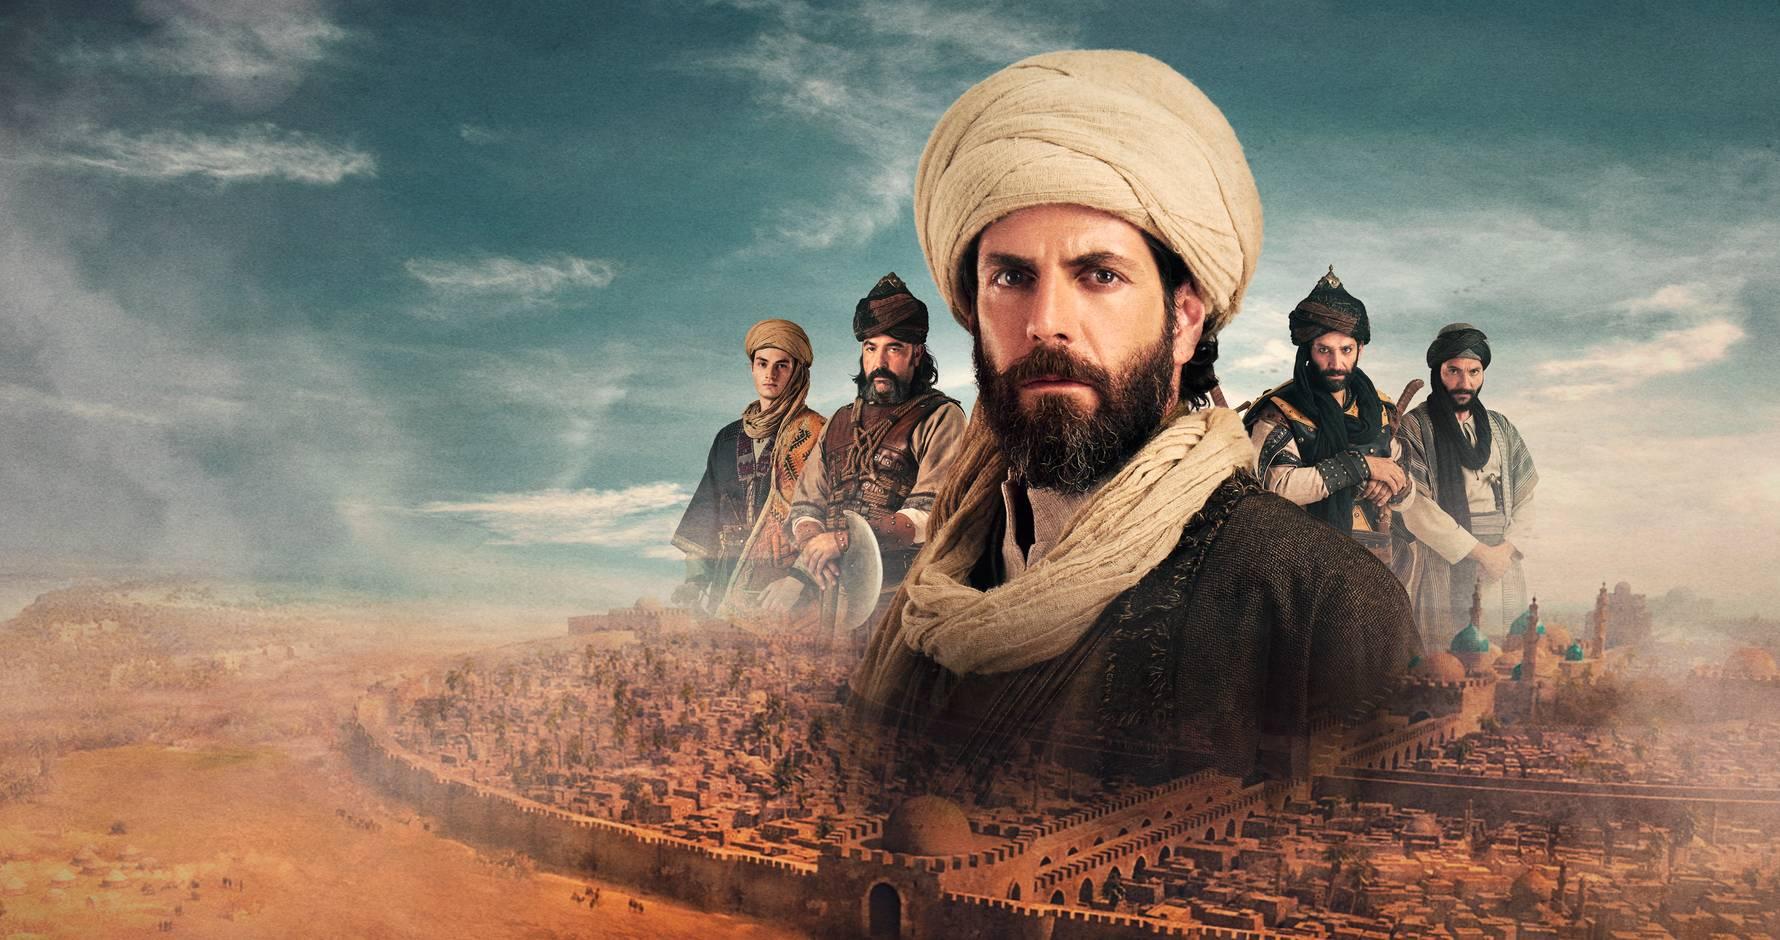 Mavera Season 1 in Urdu Subtitles - Free of Cost